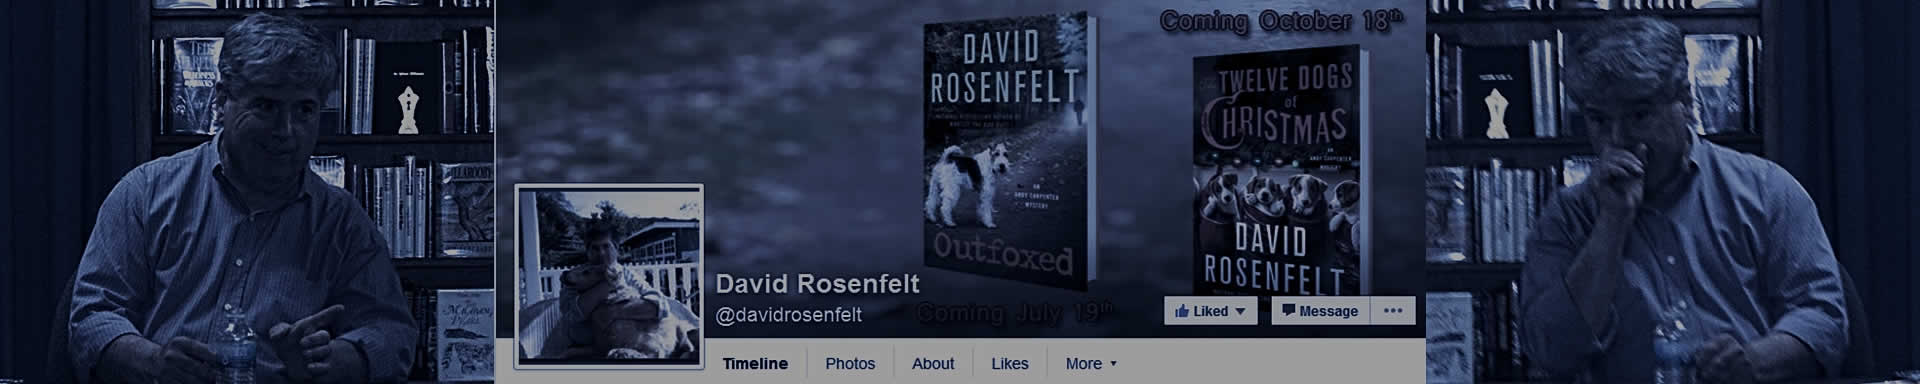 David Rosenfelt News & Information